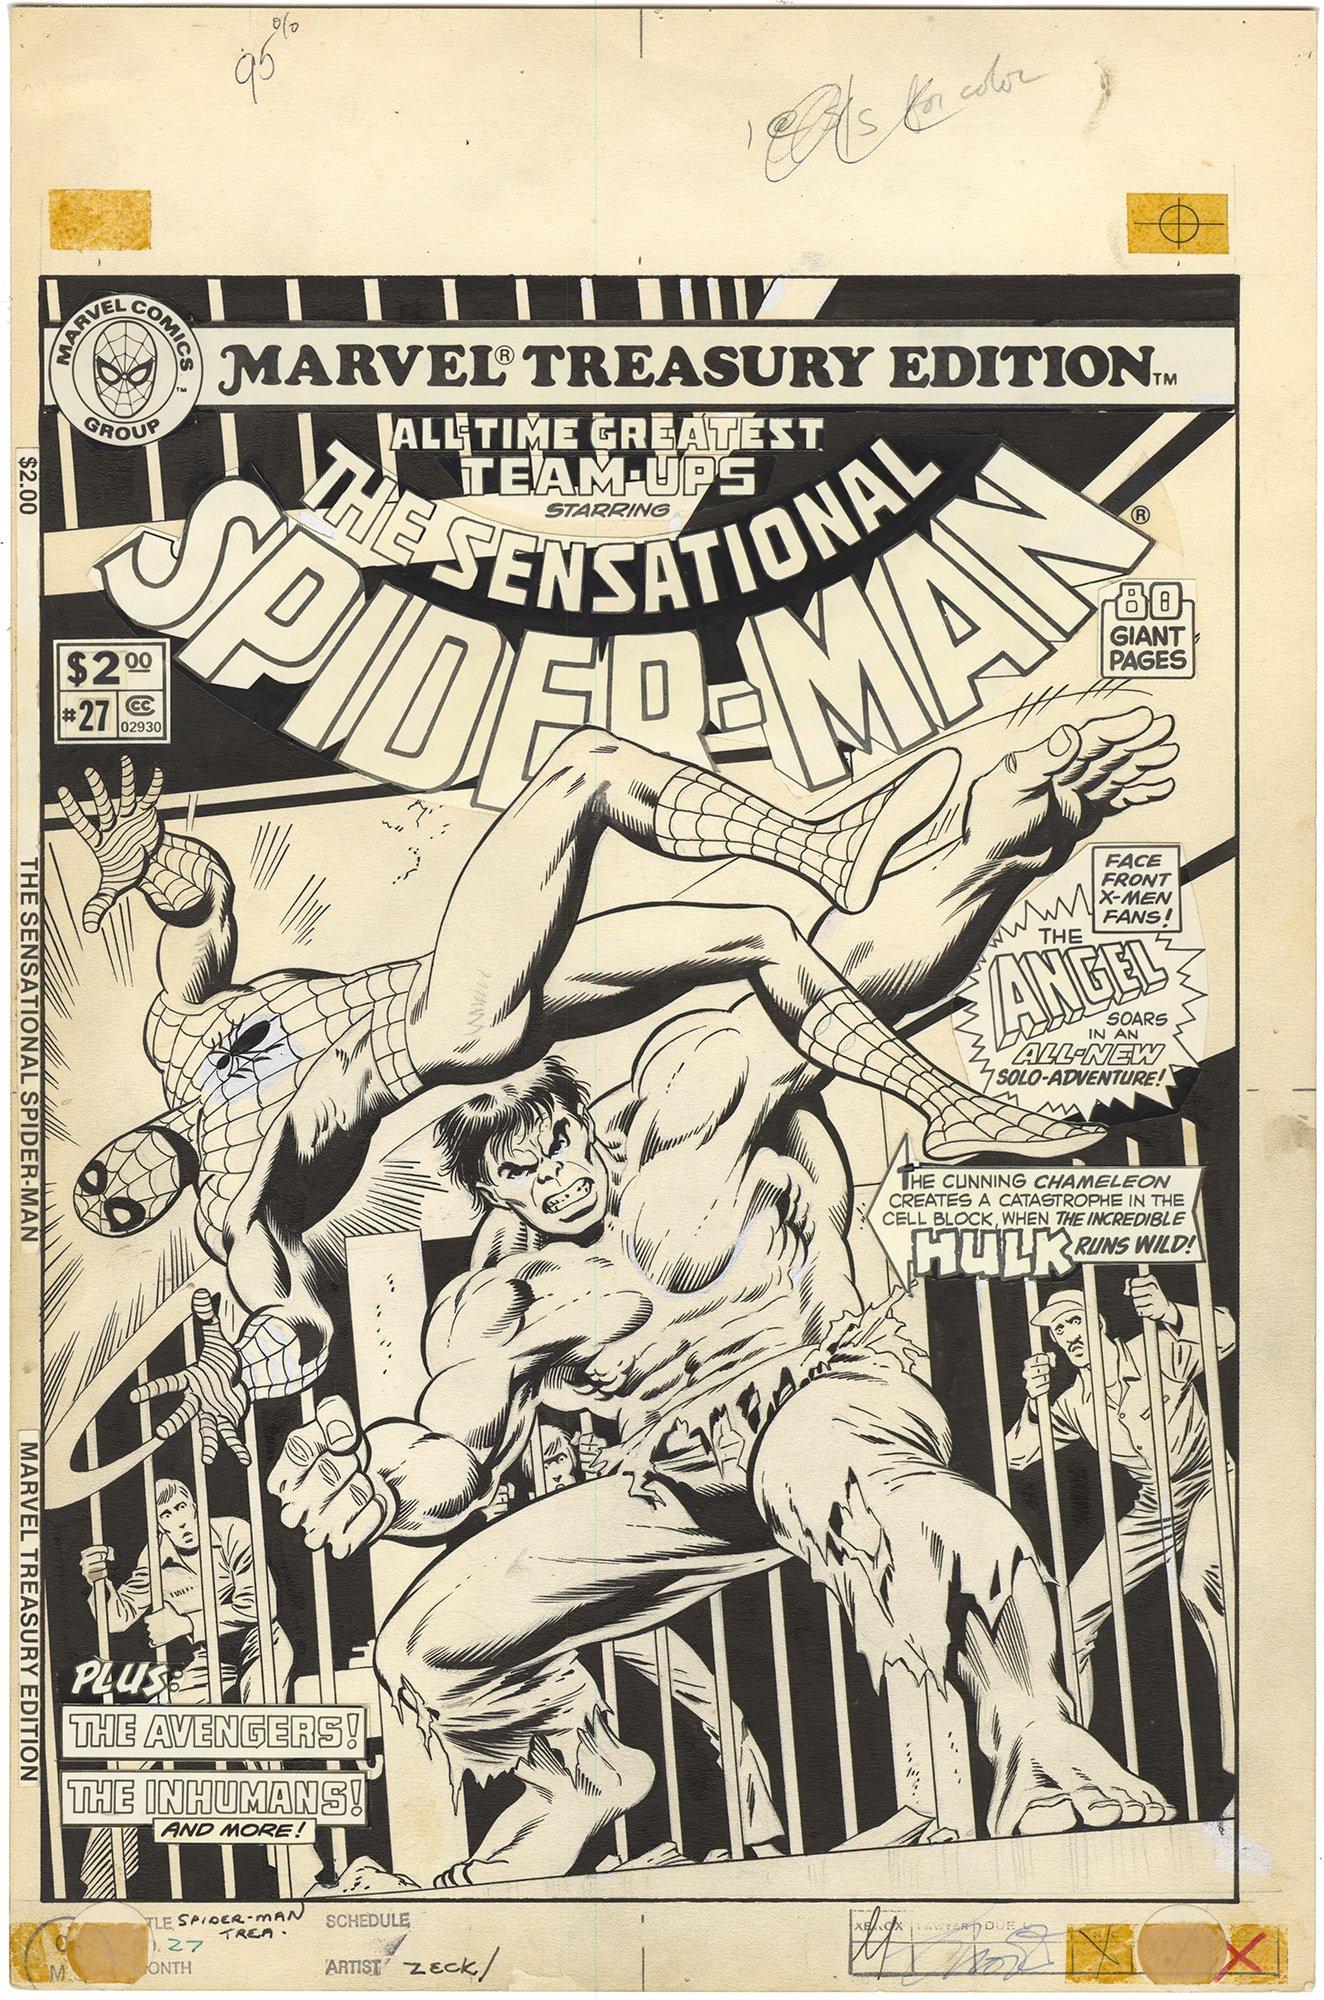 Marvel Treasury Edition - Sensational Spider-Man #27 Cover